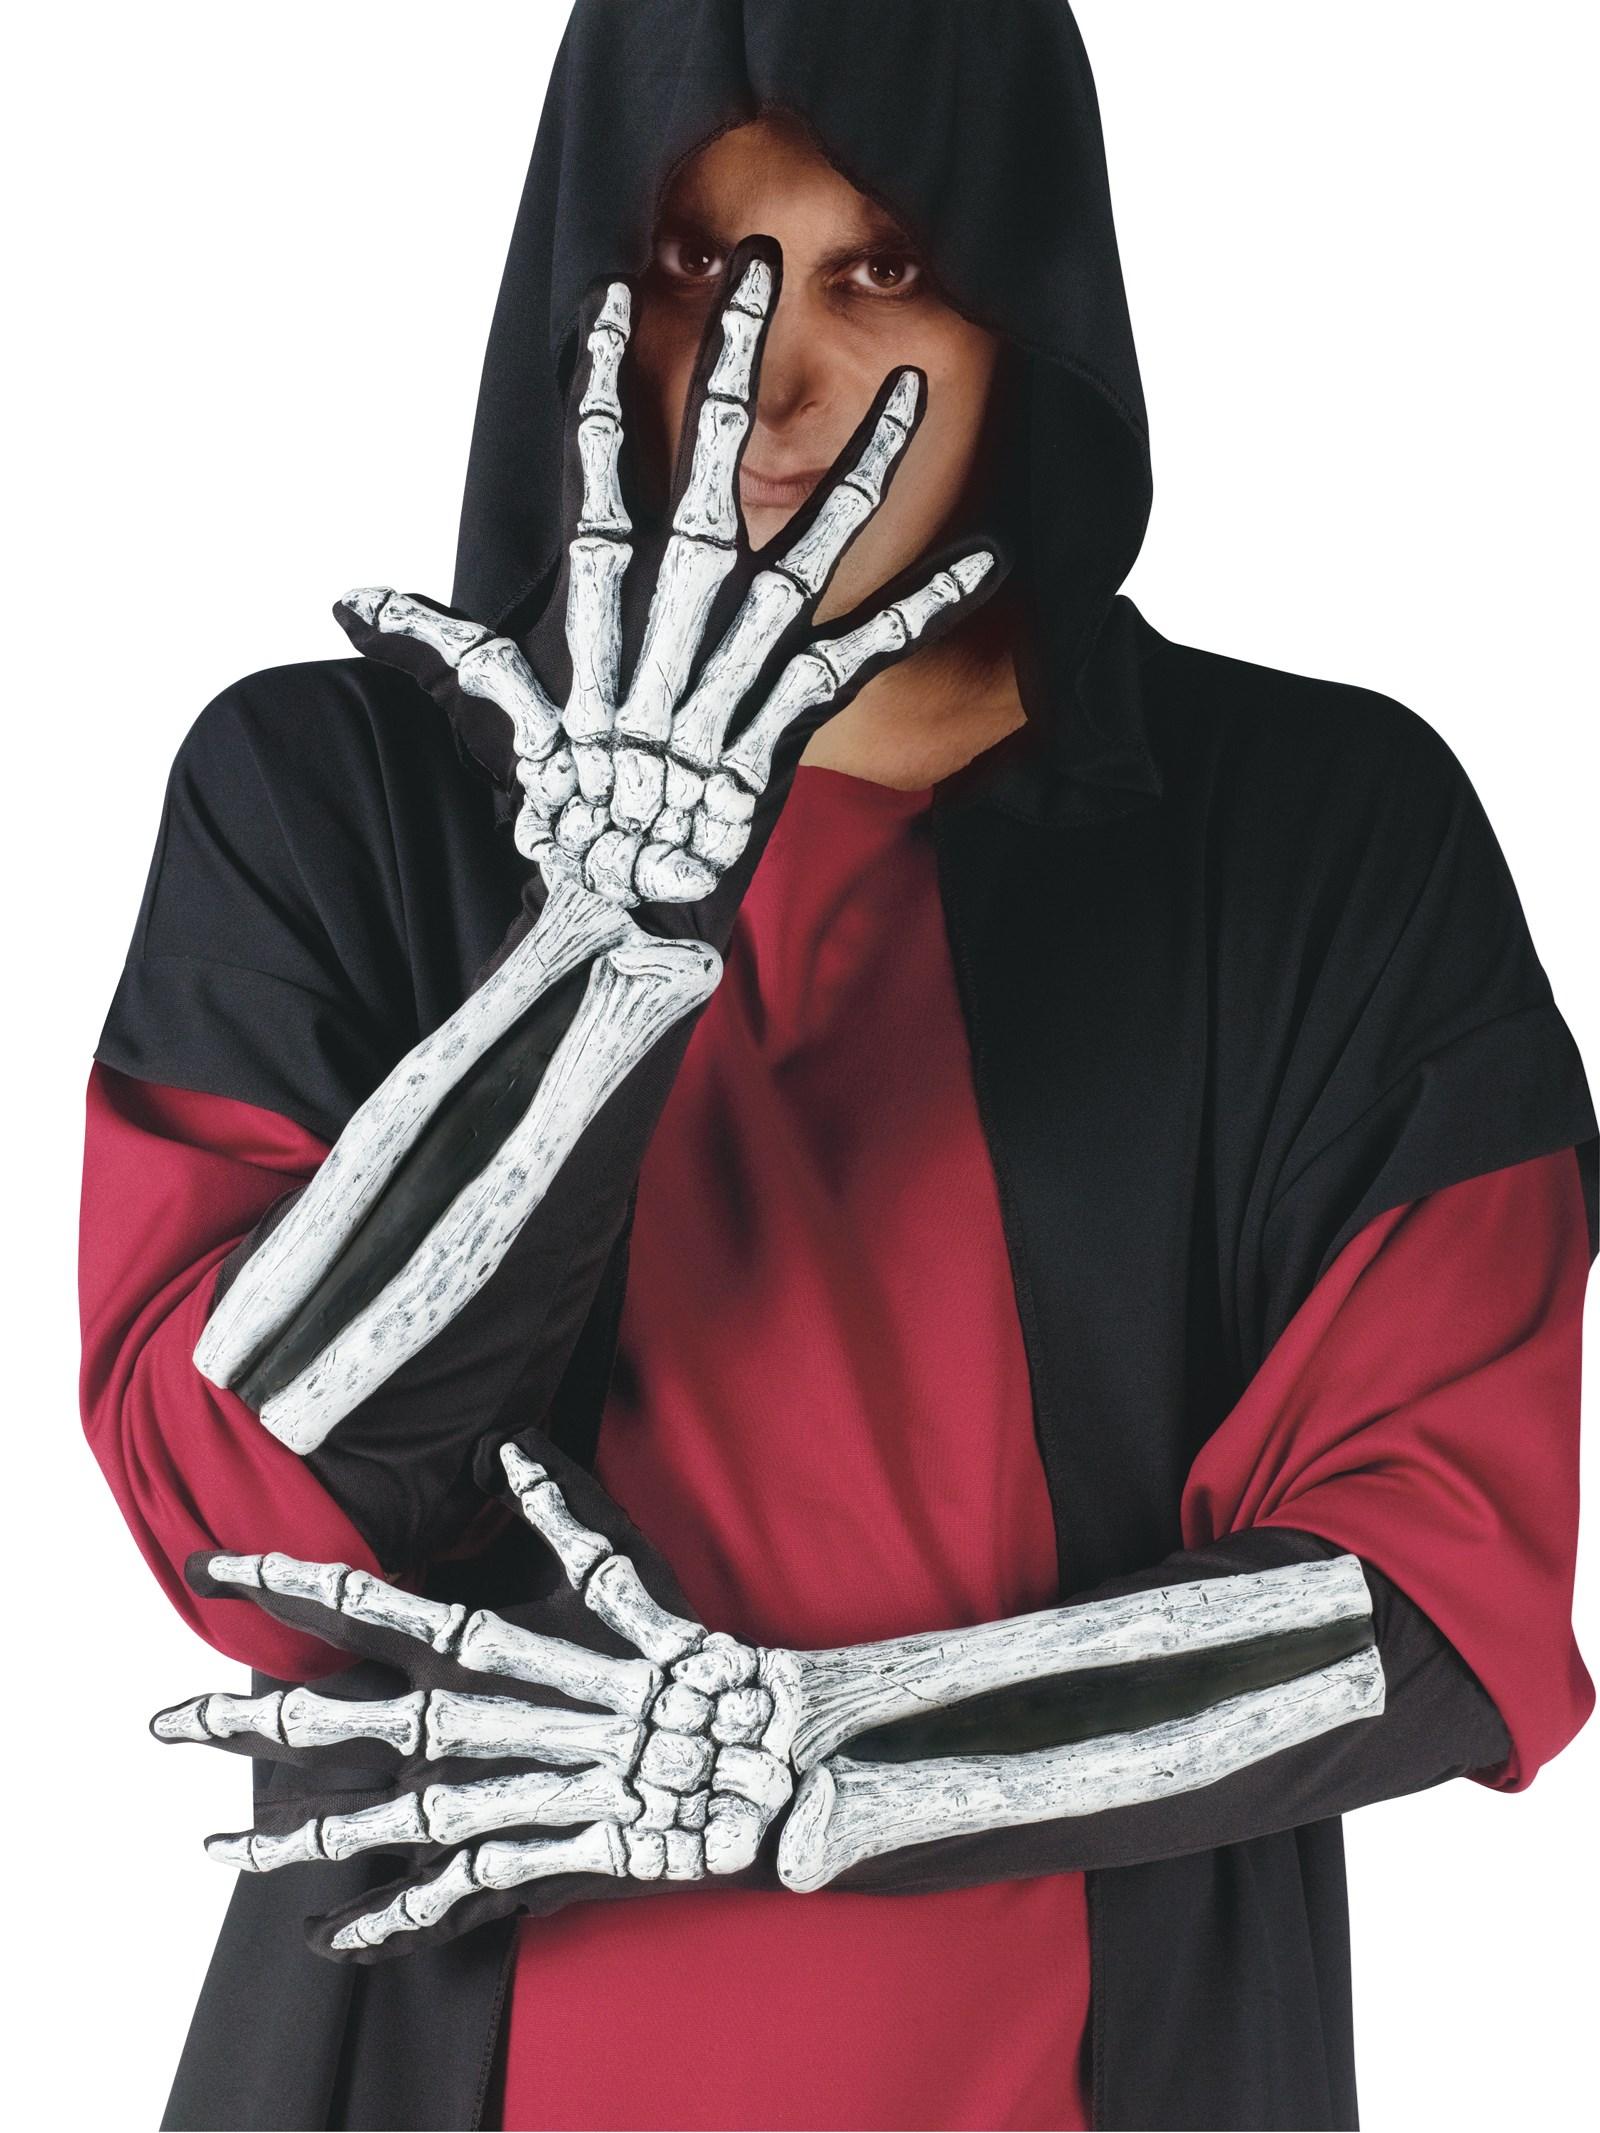 Skeleton Glove And Wrist Bone Gloves Adult